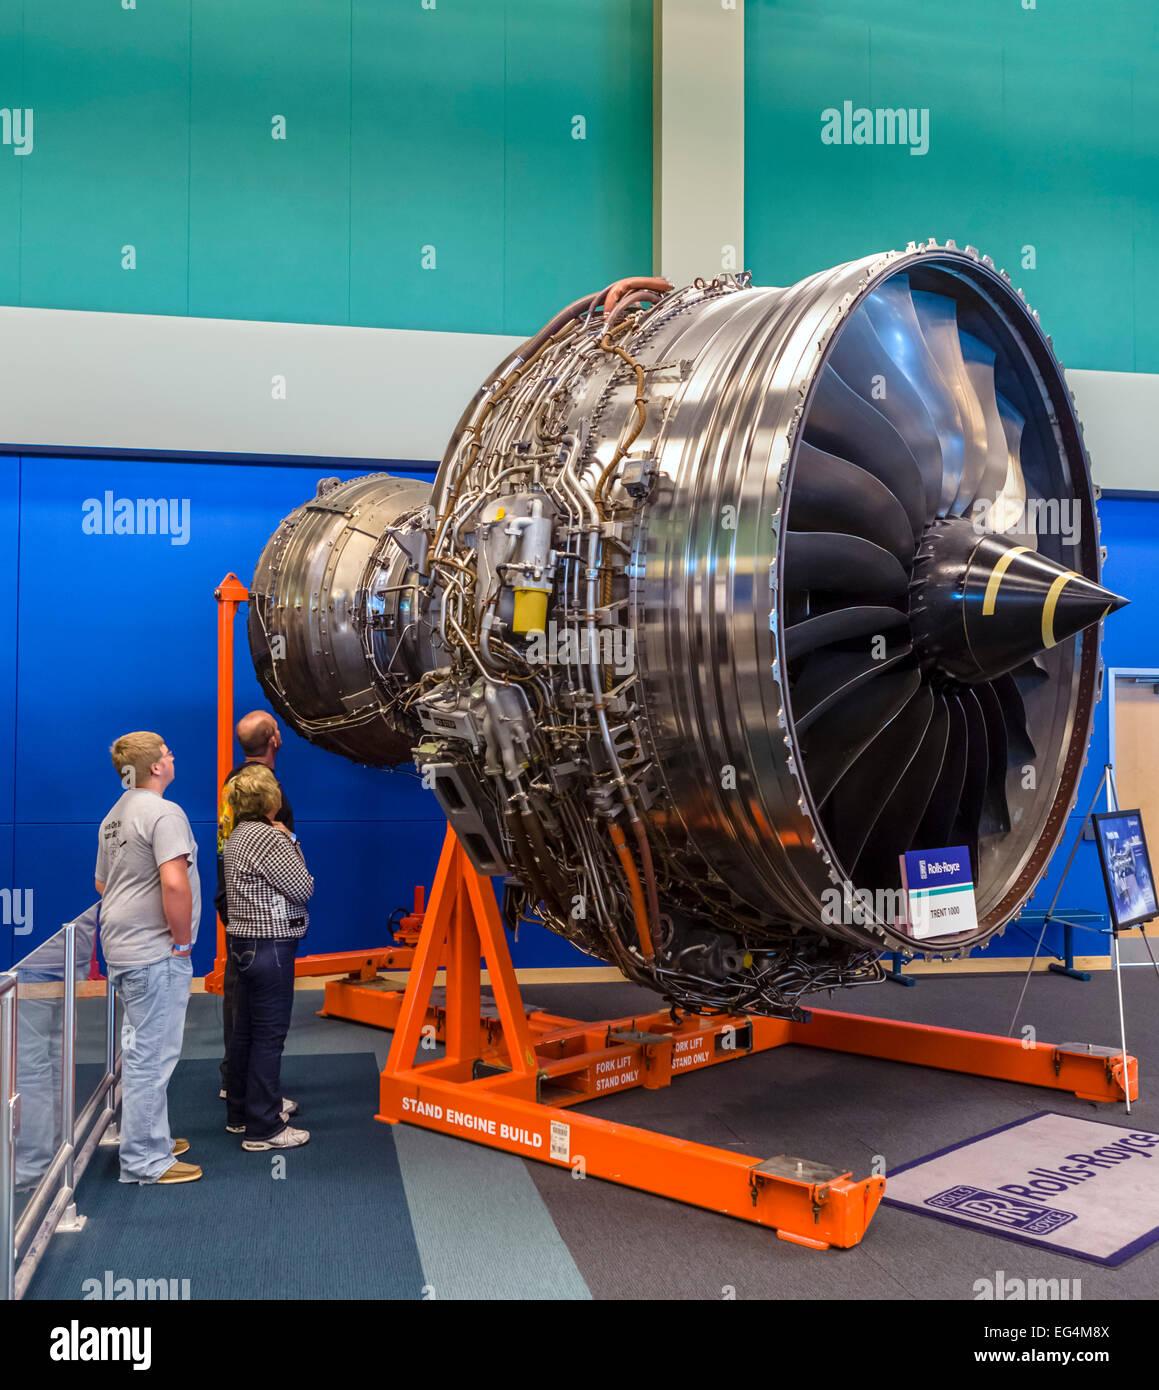 Una Rolls-Royce Trent 1000 motore turbofan, Infinity Science Center, Giovanni C Stennis Space Center, Mississippi, Immagini Stock